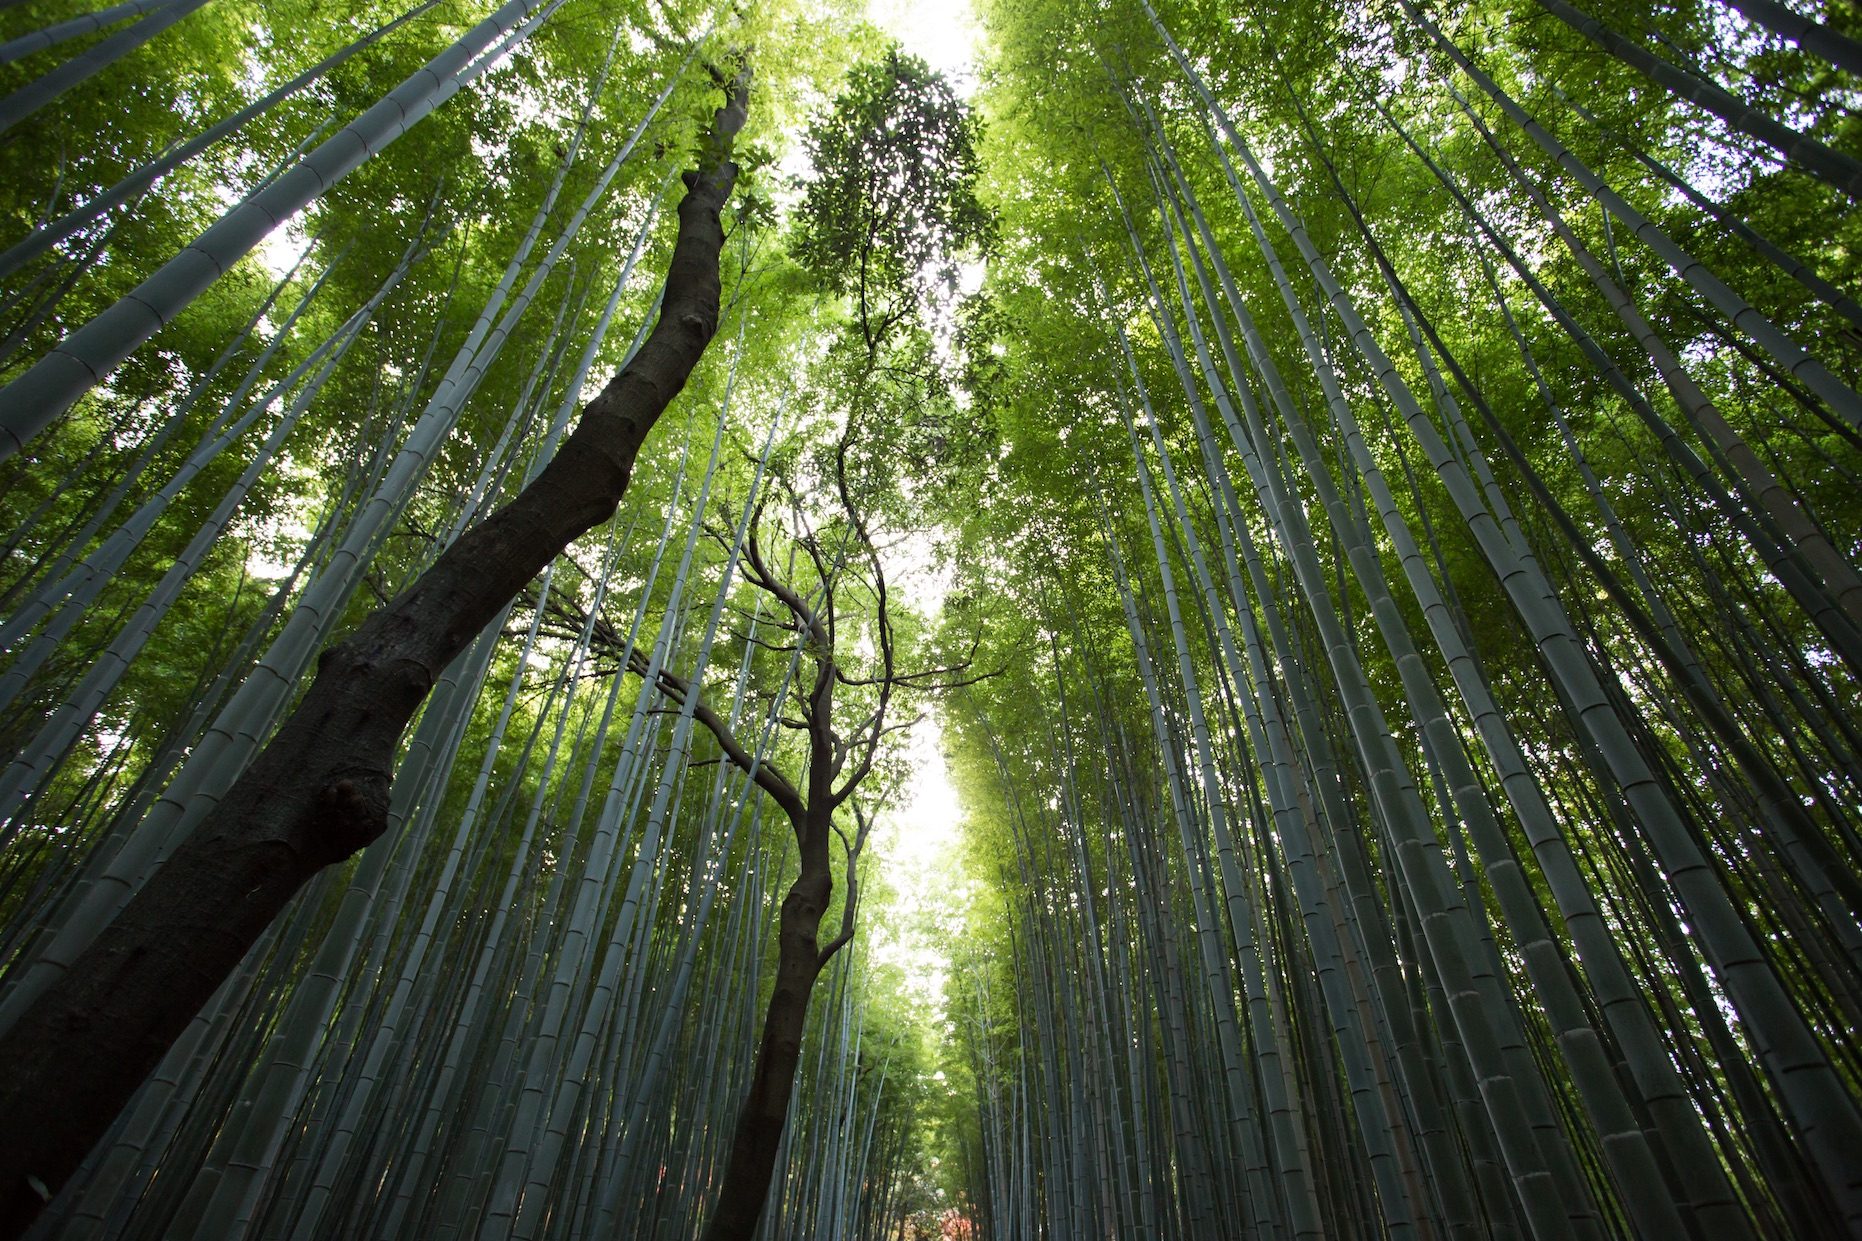 Walk among the mystical bamboo groves at Arashiyama